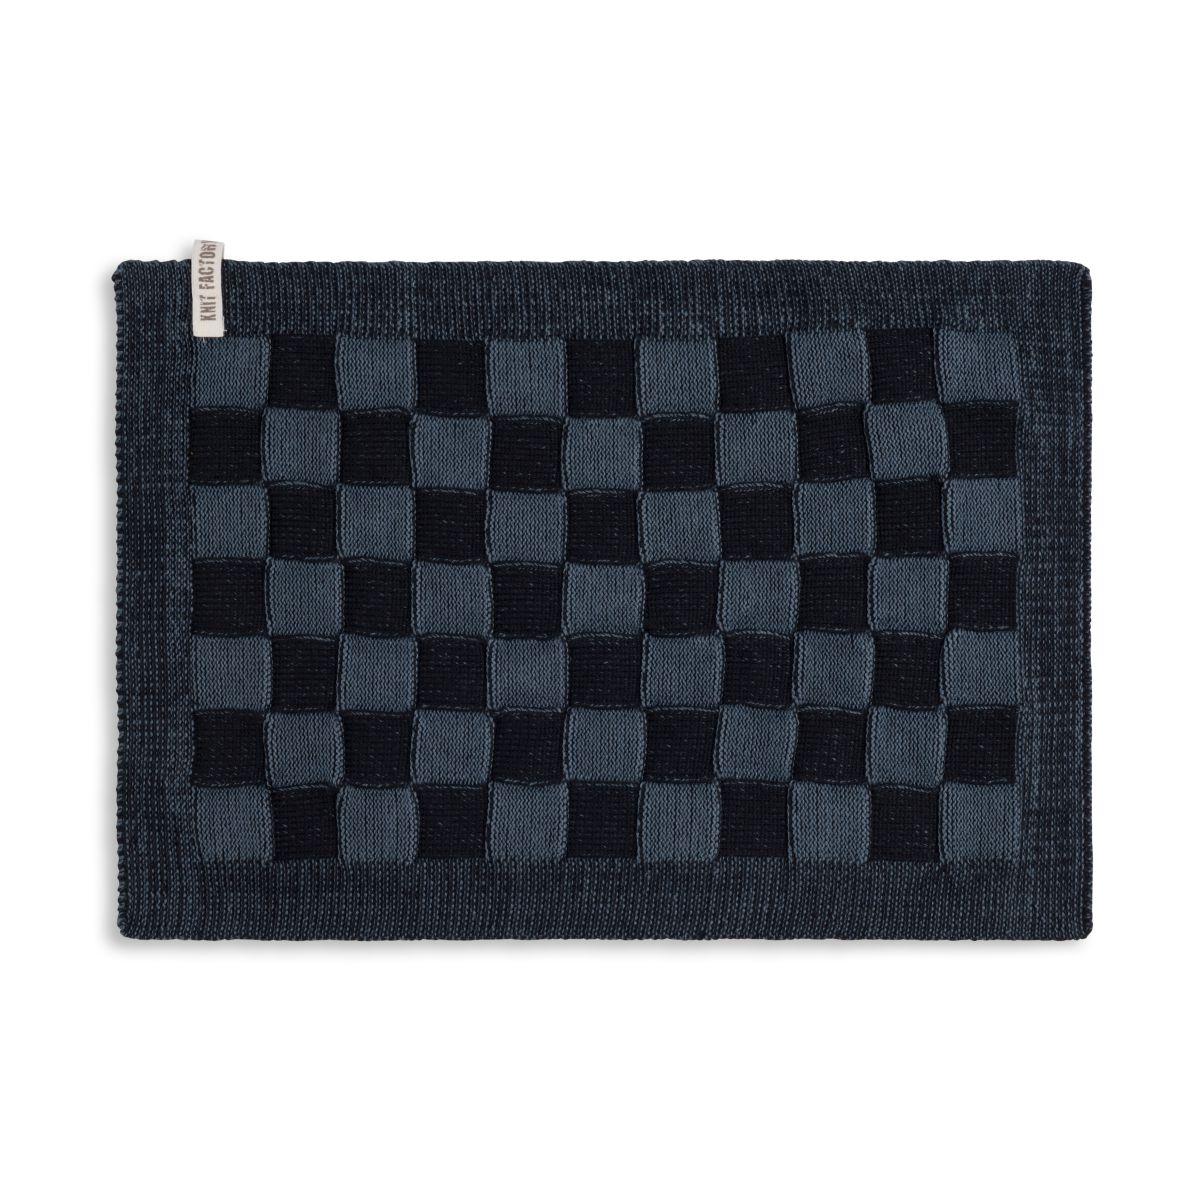 knit factory 2010268 placemat grote blok 2 kleuren zwart granit